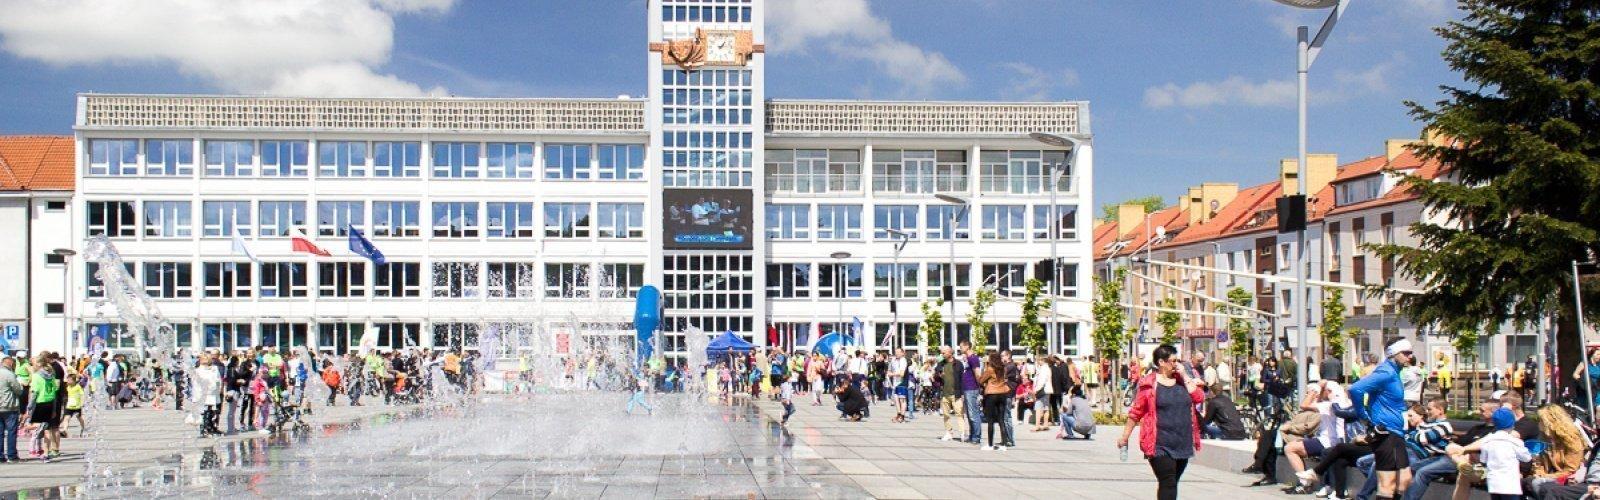 Szlakiem historii Koszalina